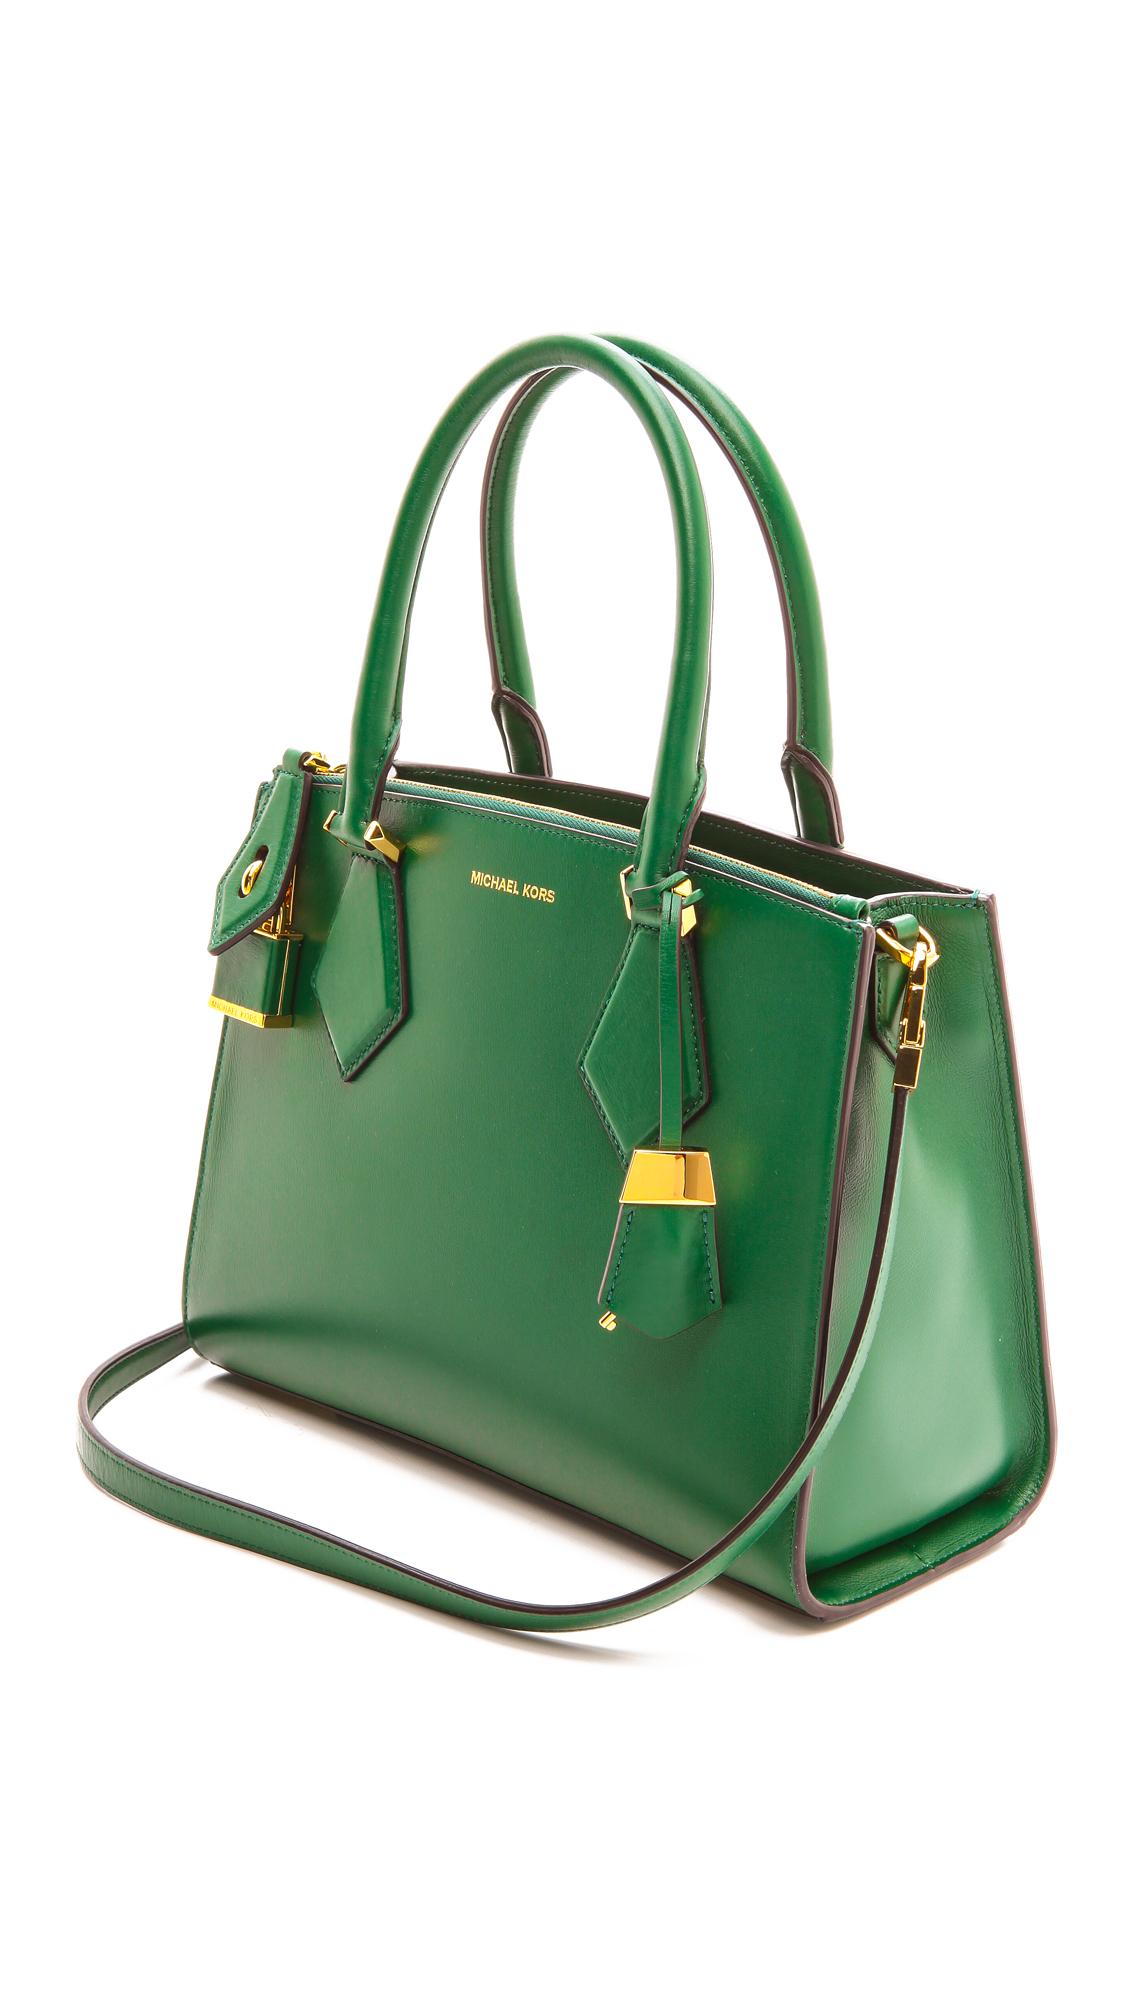 4fb5bc3cda93 ... get lyst michael kors casey medium satchel dark emerald in green bcea5  3d366